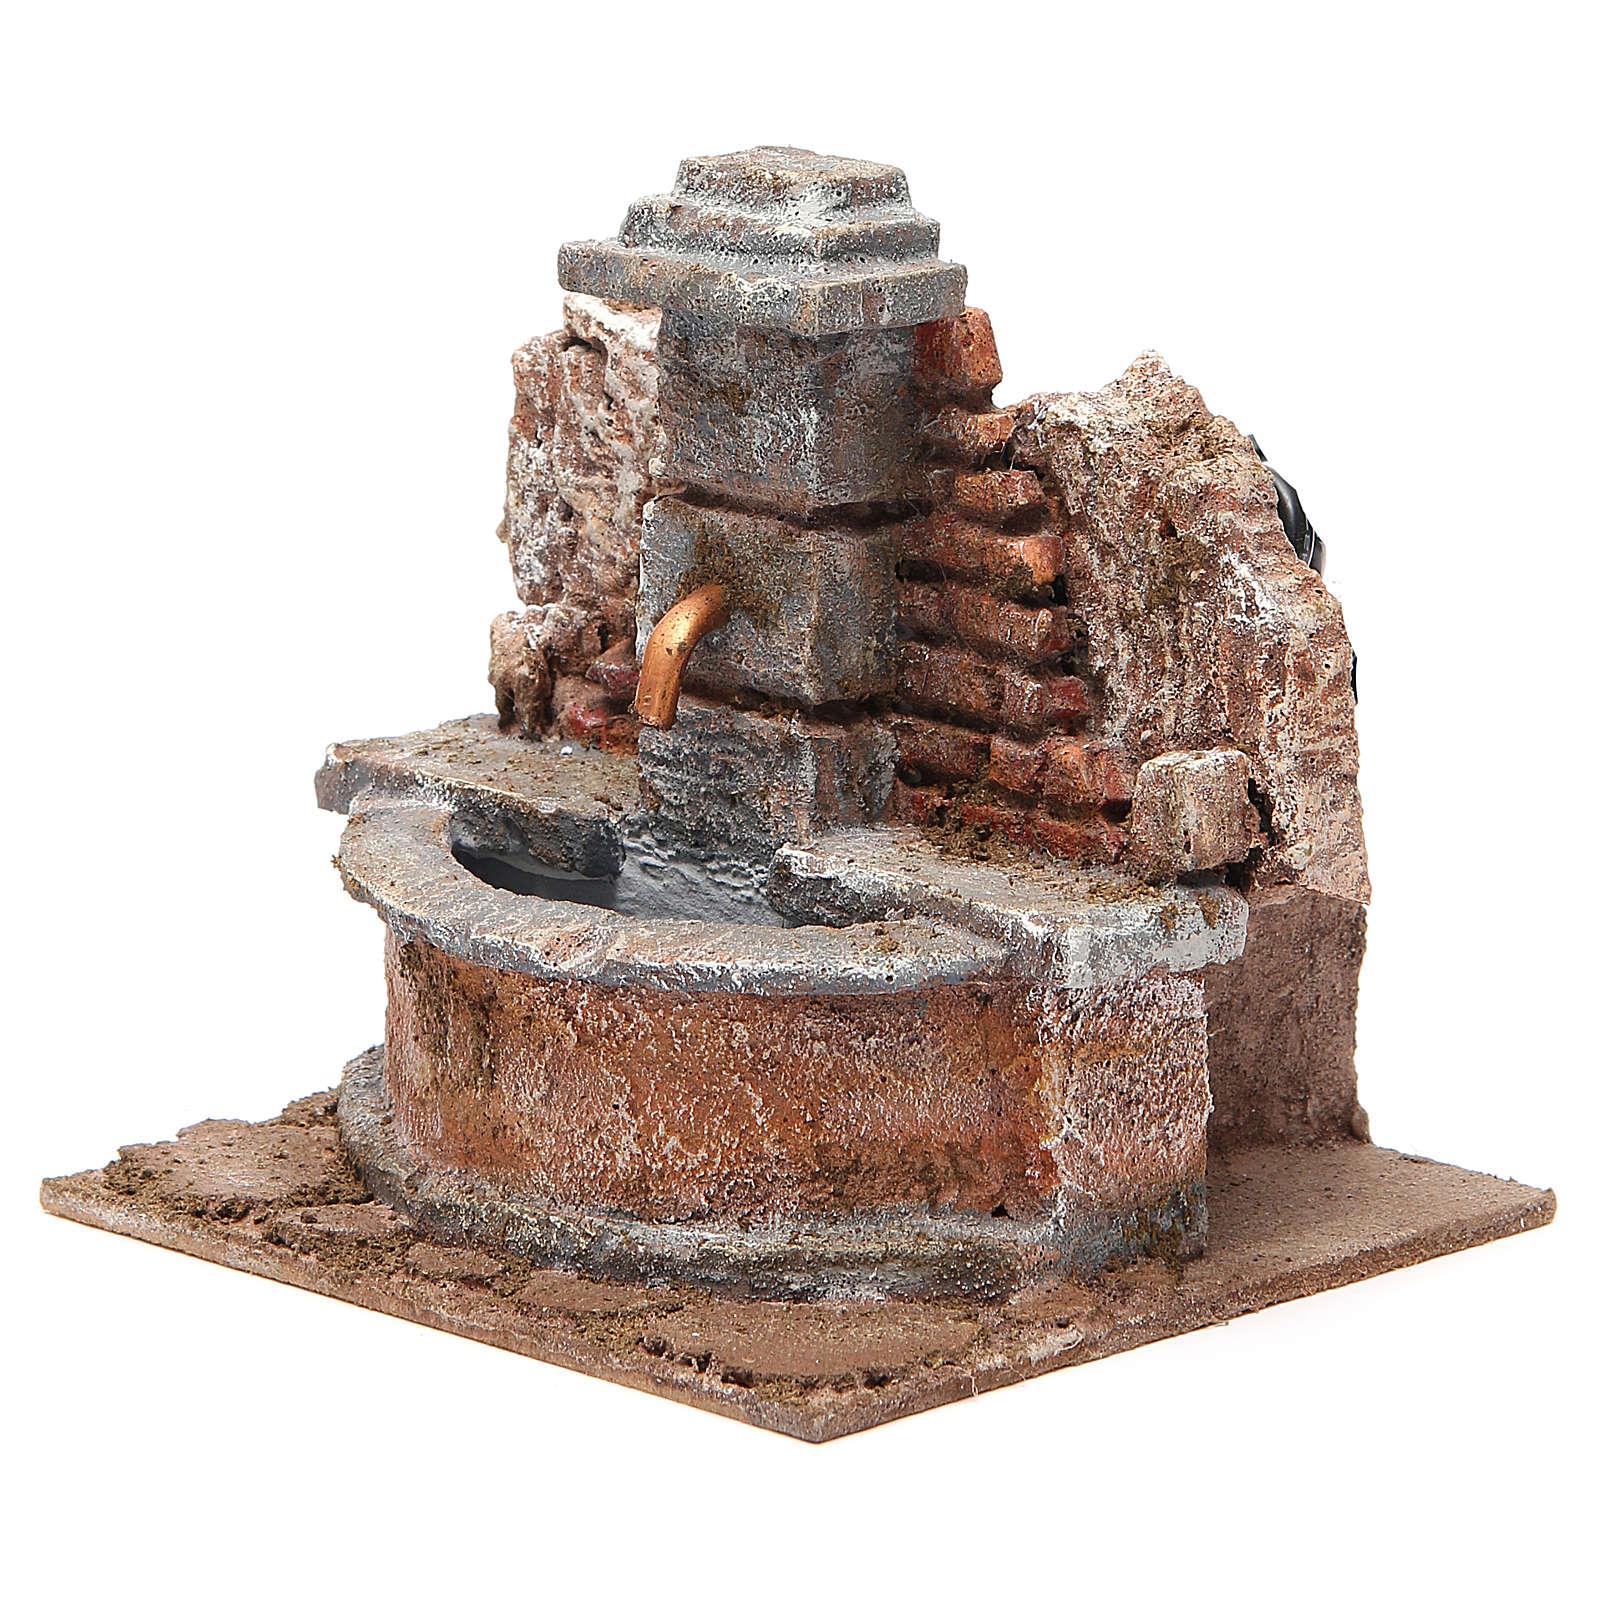 Fuente belén eléctrica entre las rocas 18x16x16 cm 4